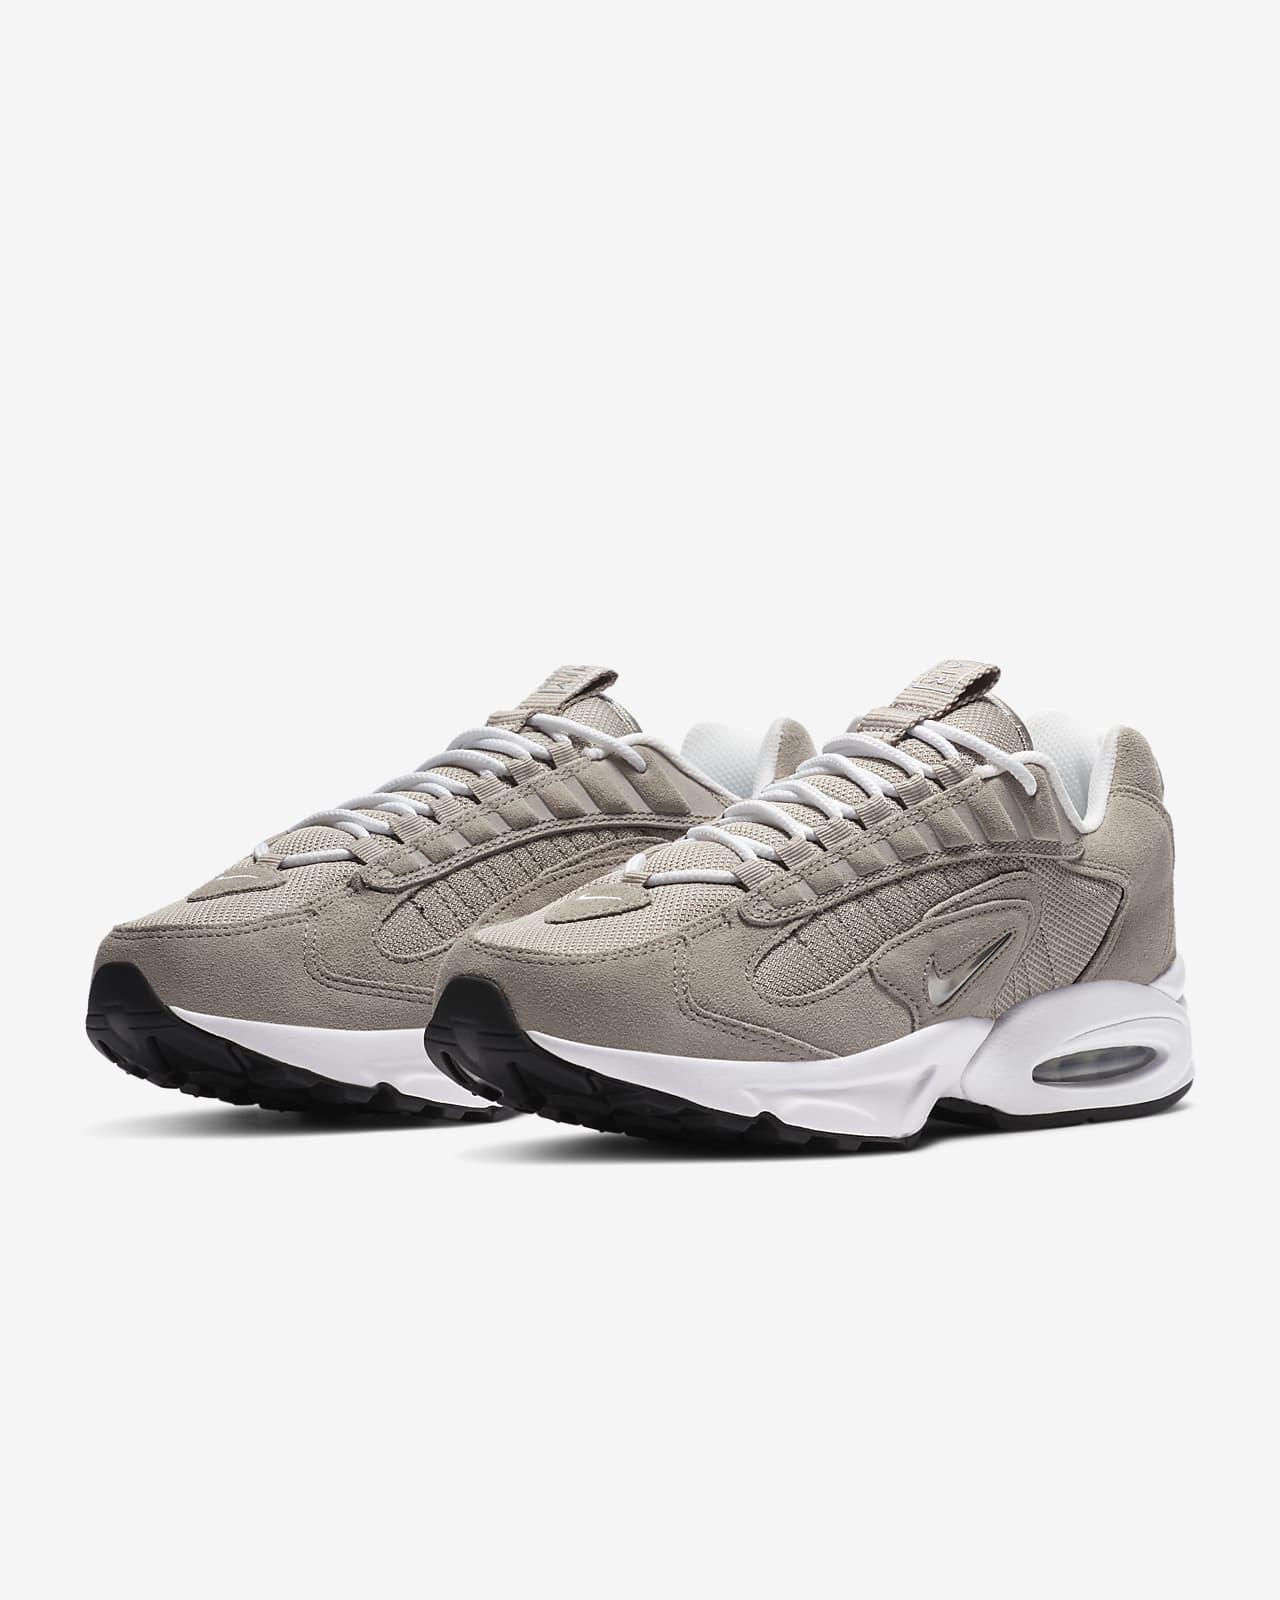 Chaussure Nike Air Max Triax LE pour Homme